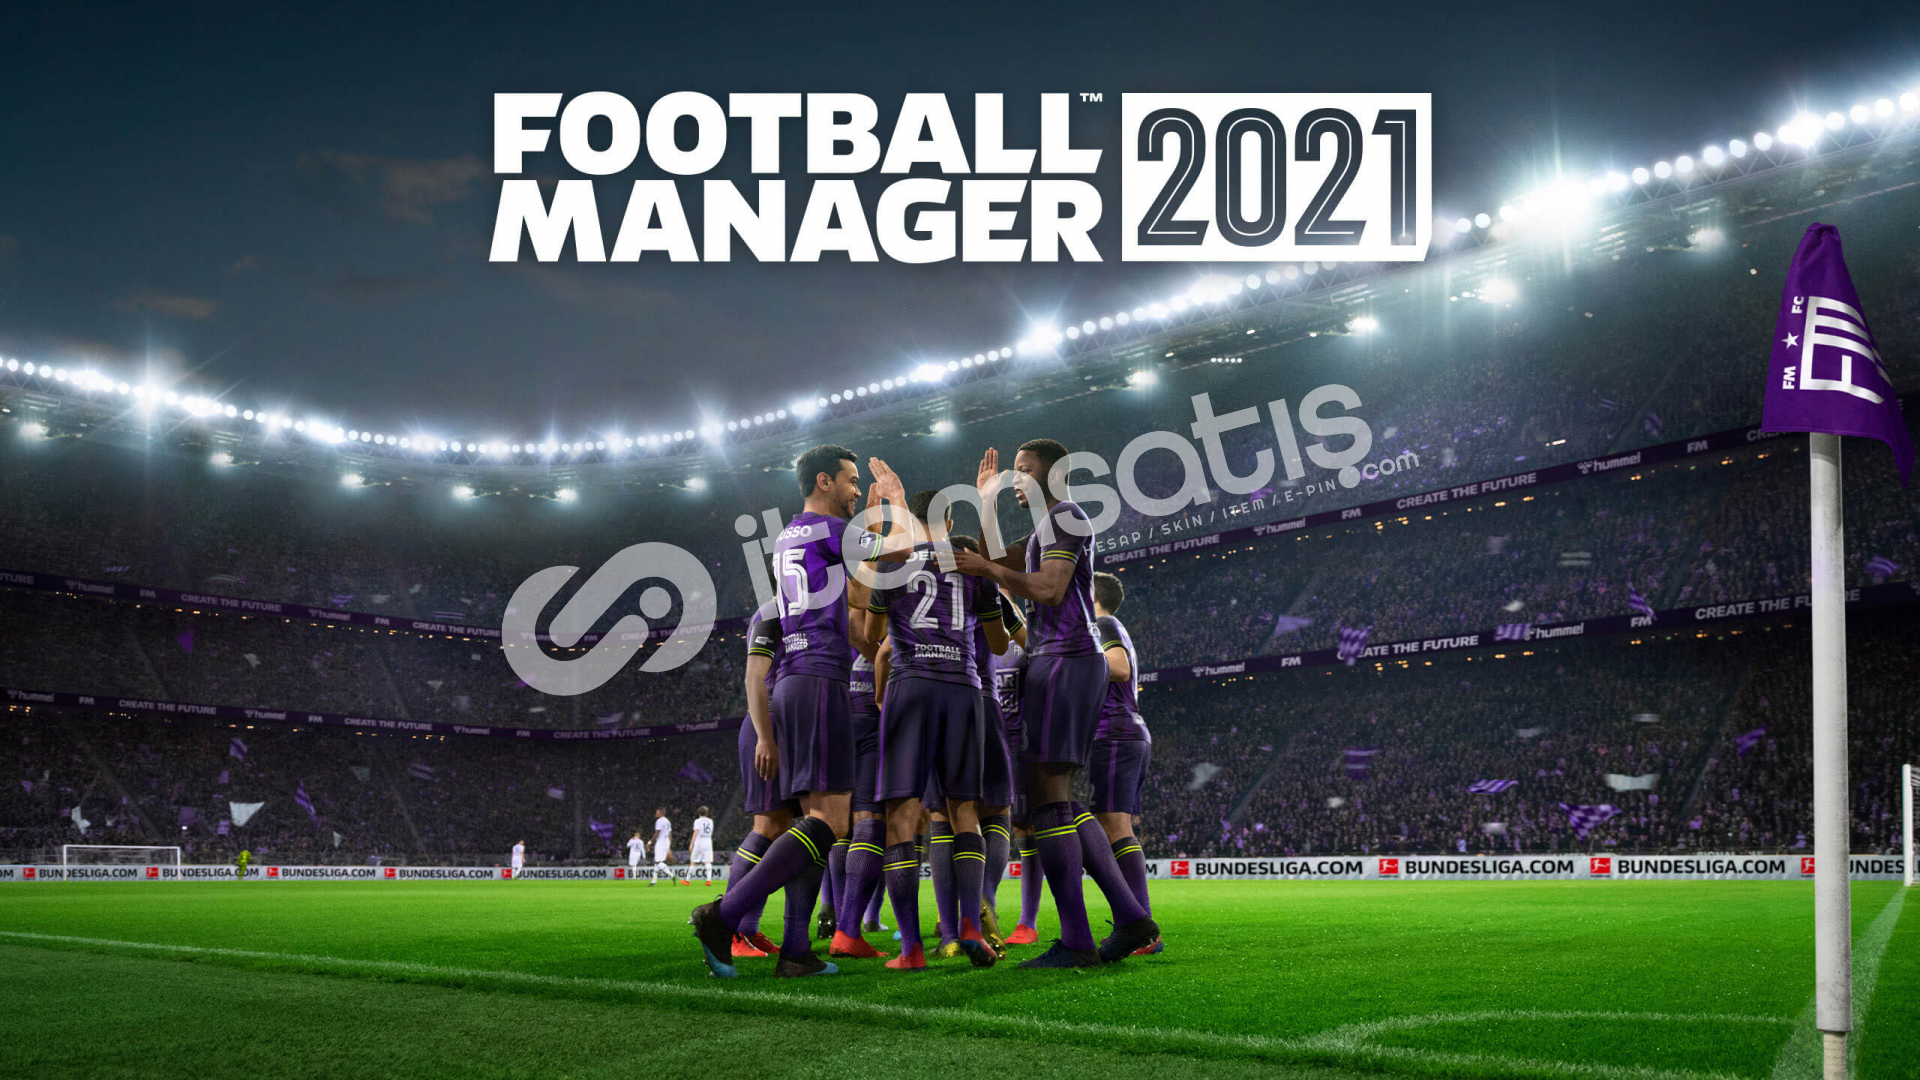 Football Manager 2021 + Touch + Garanti